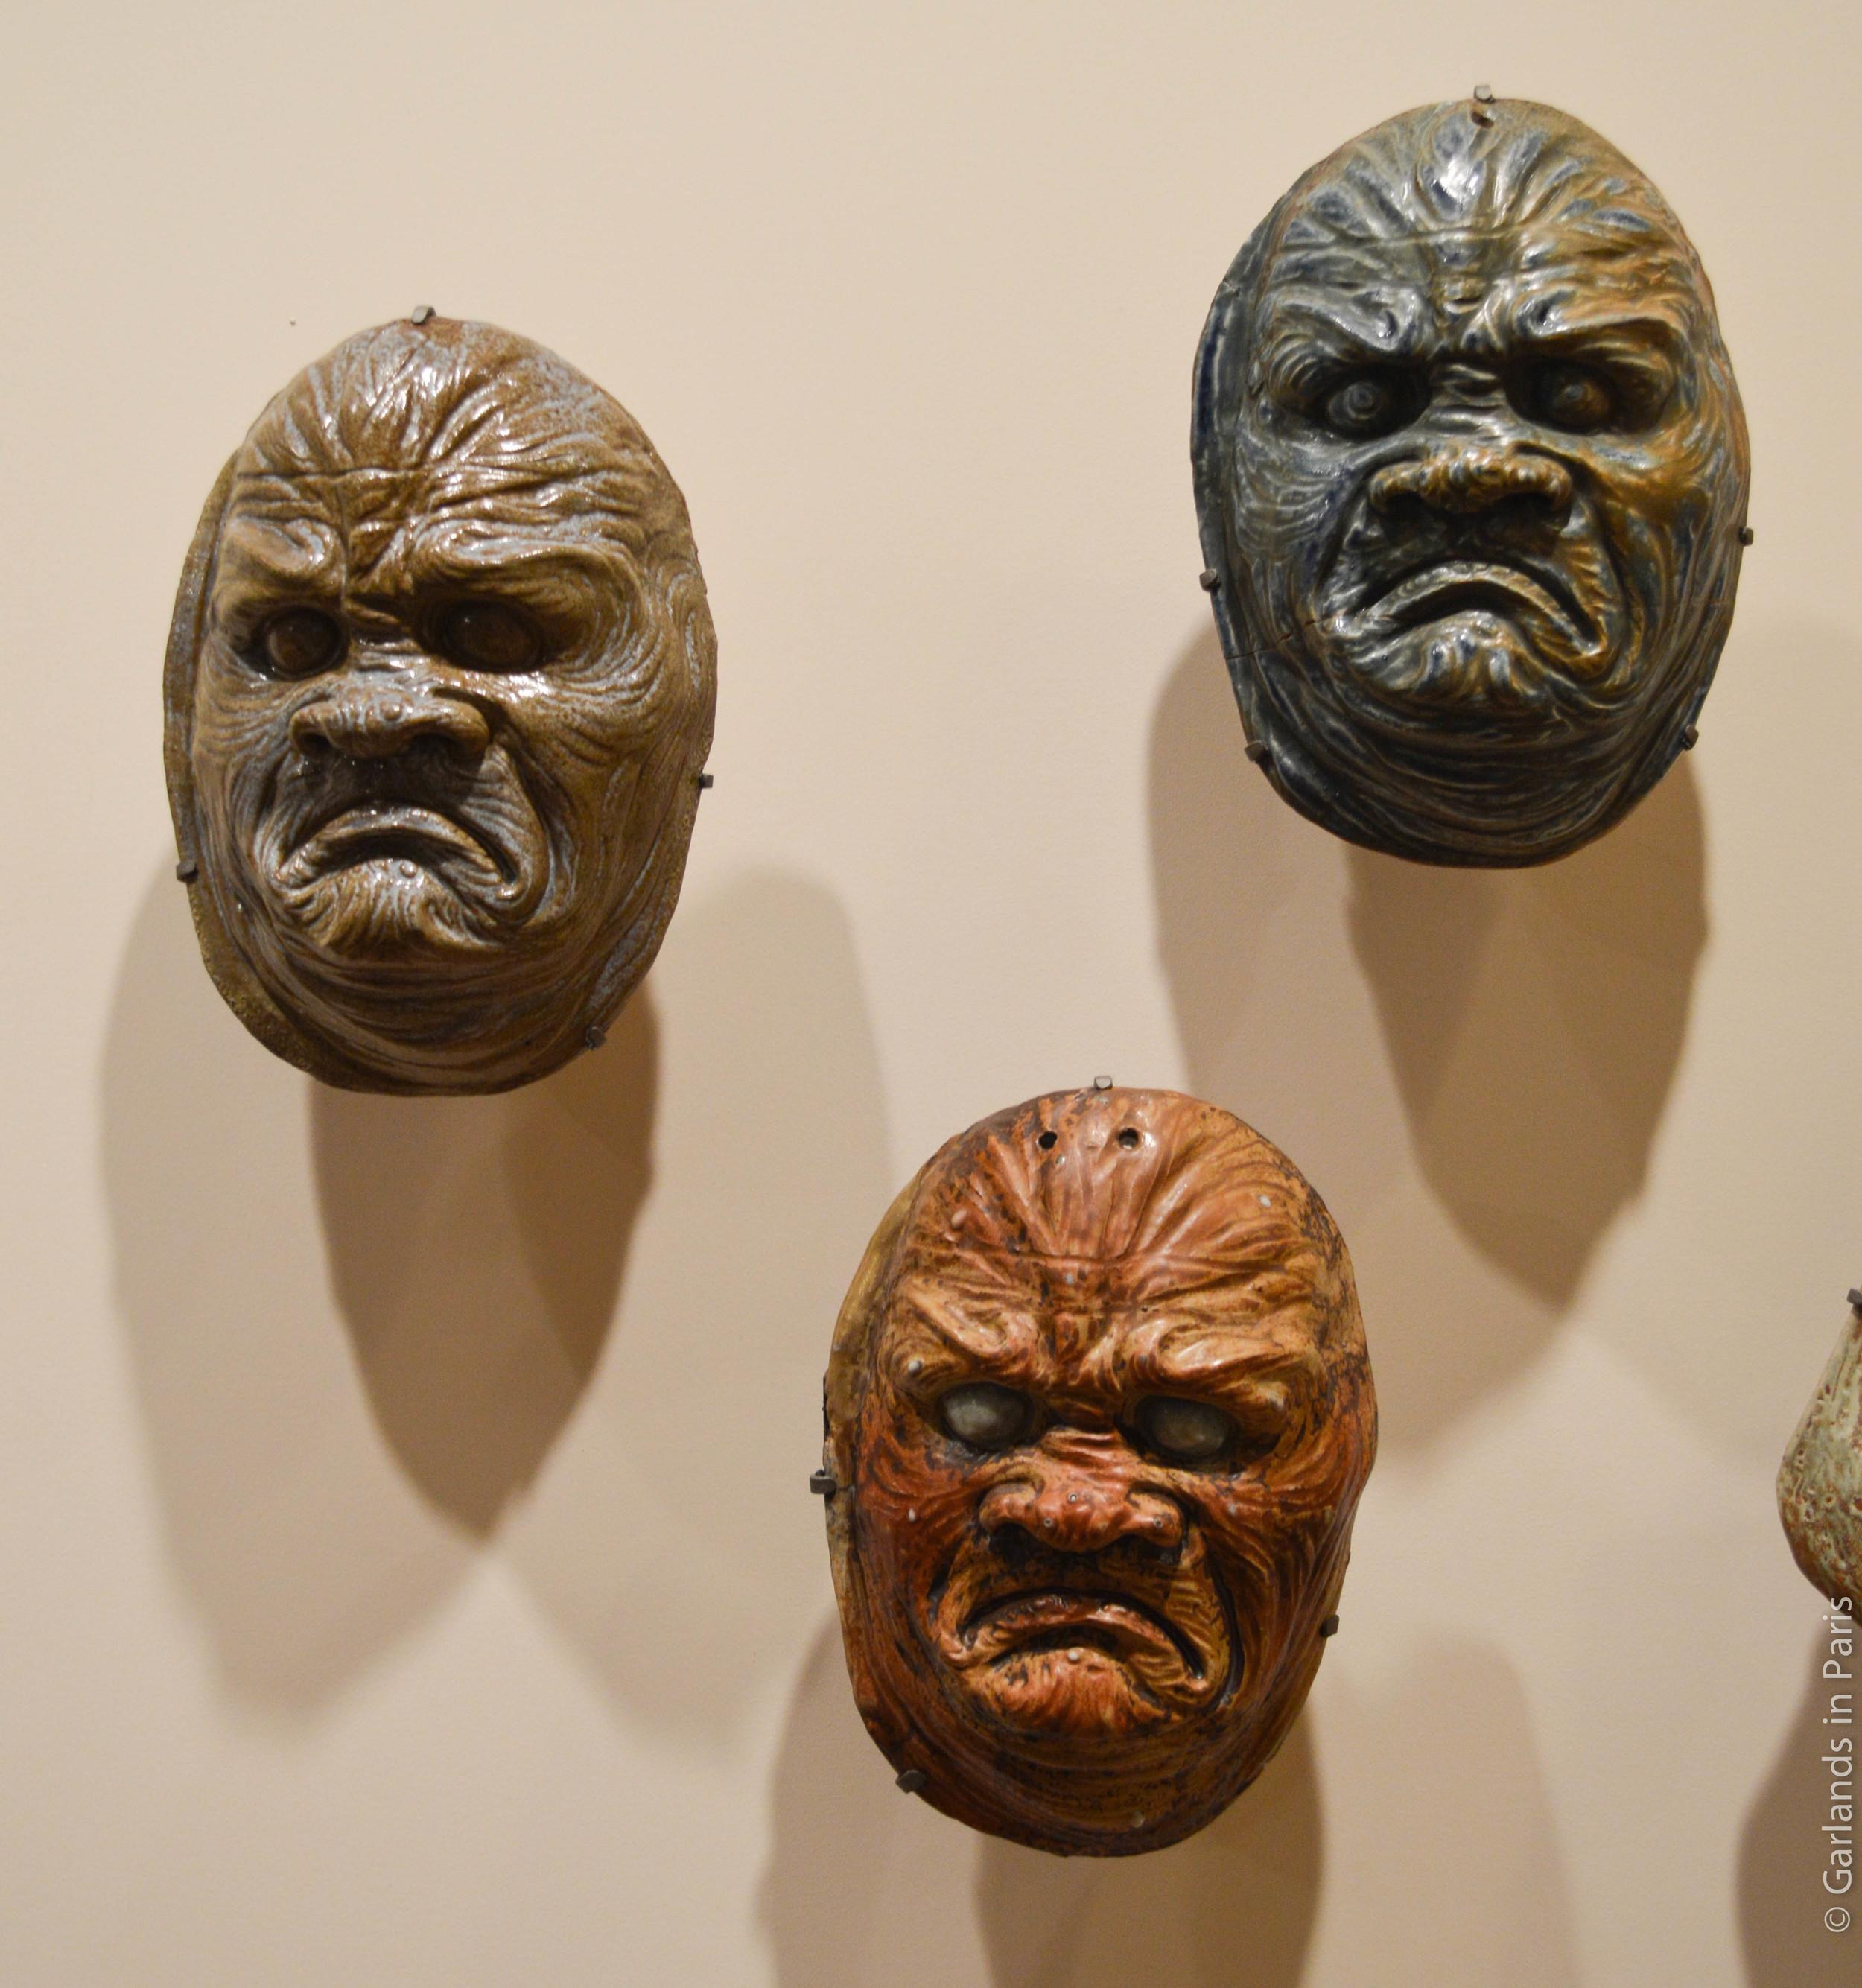 Jean Carriès, Horror Masks, Petit Palais